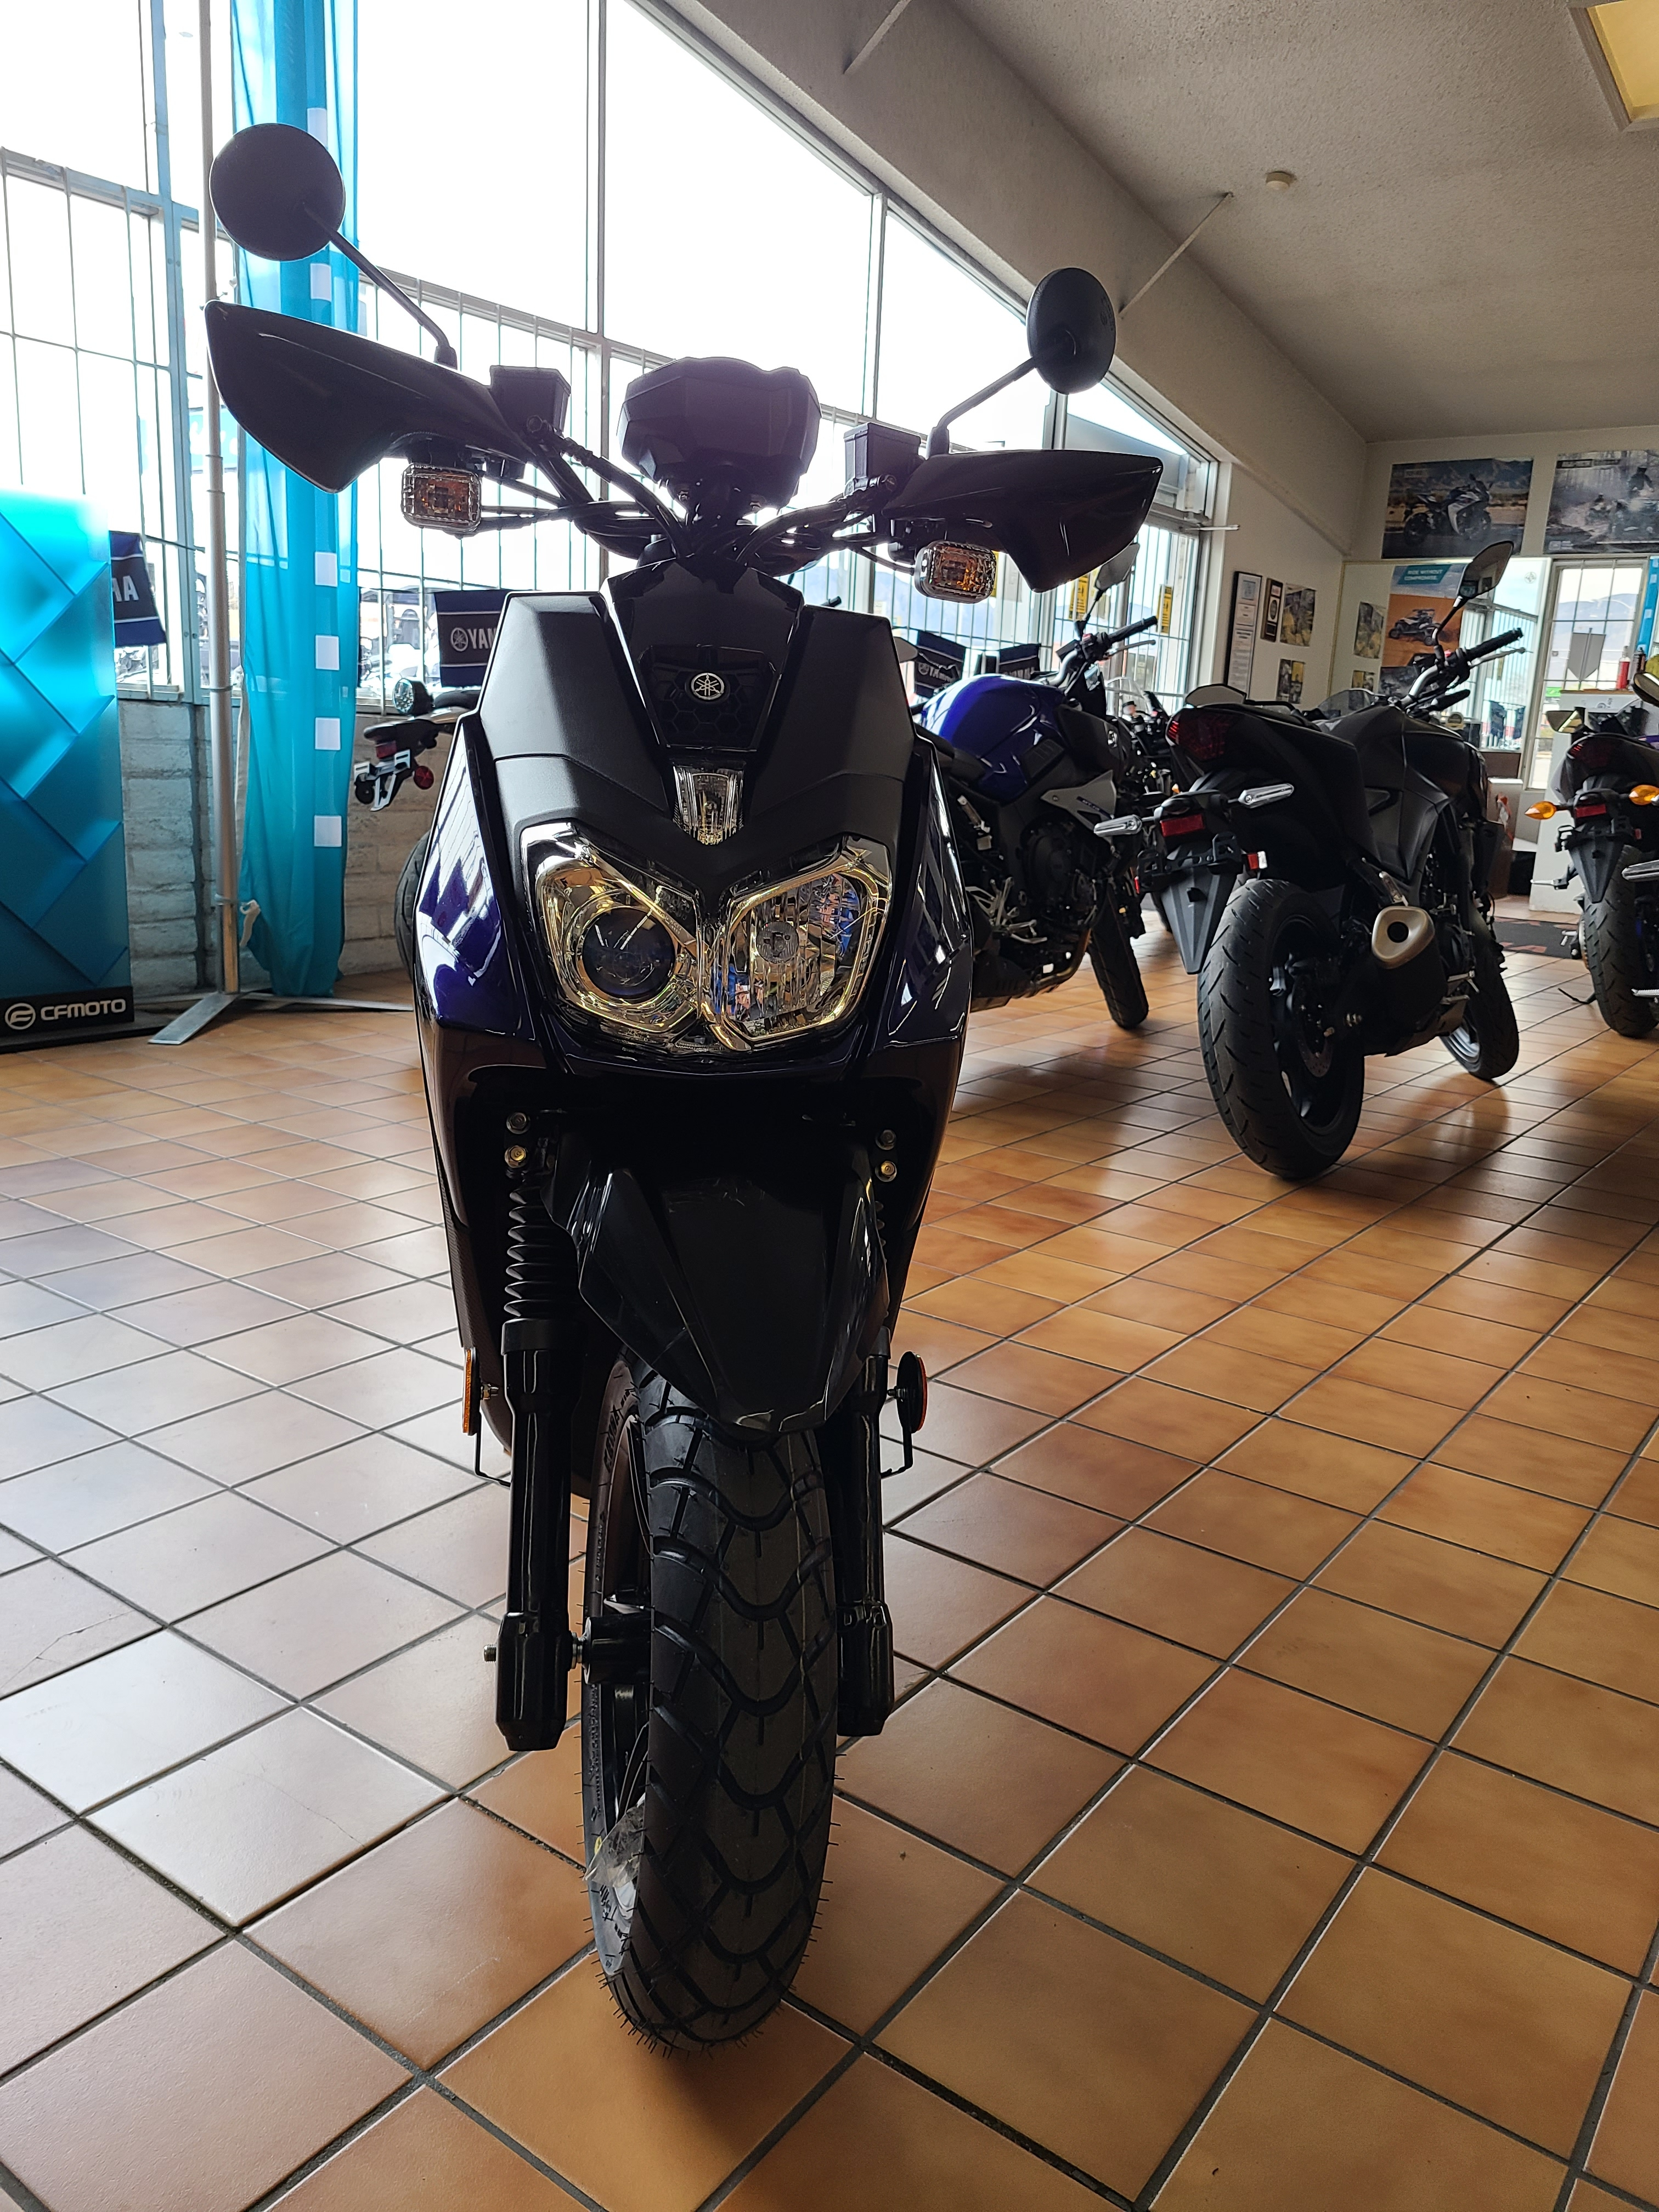 2021 Yamaha Zuma 125 at Bobby J's Yamaha, Albuquerque, NM 87110